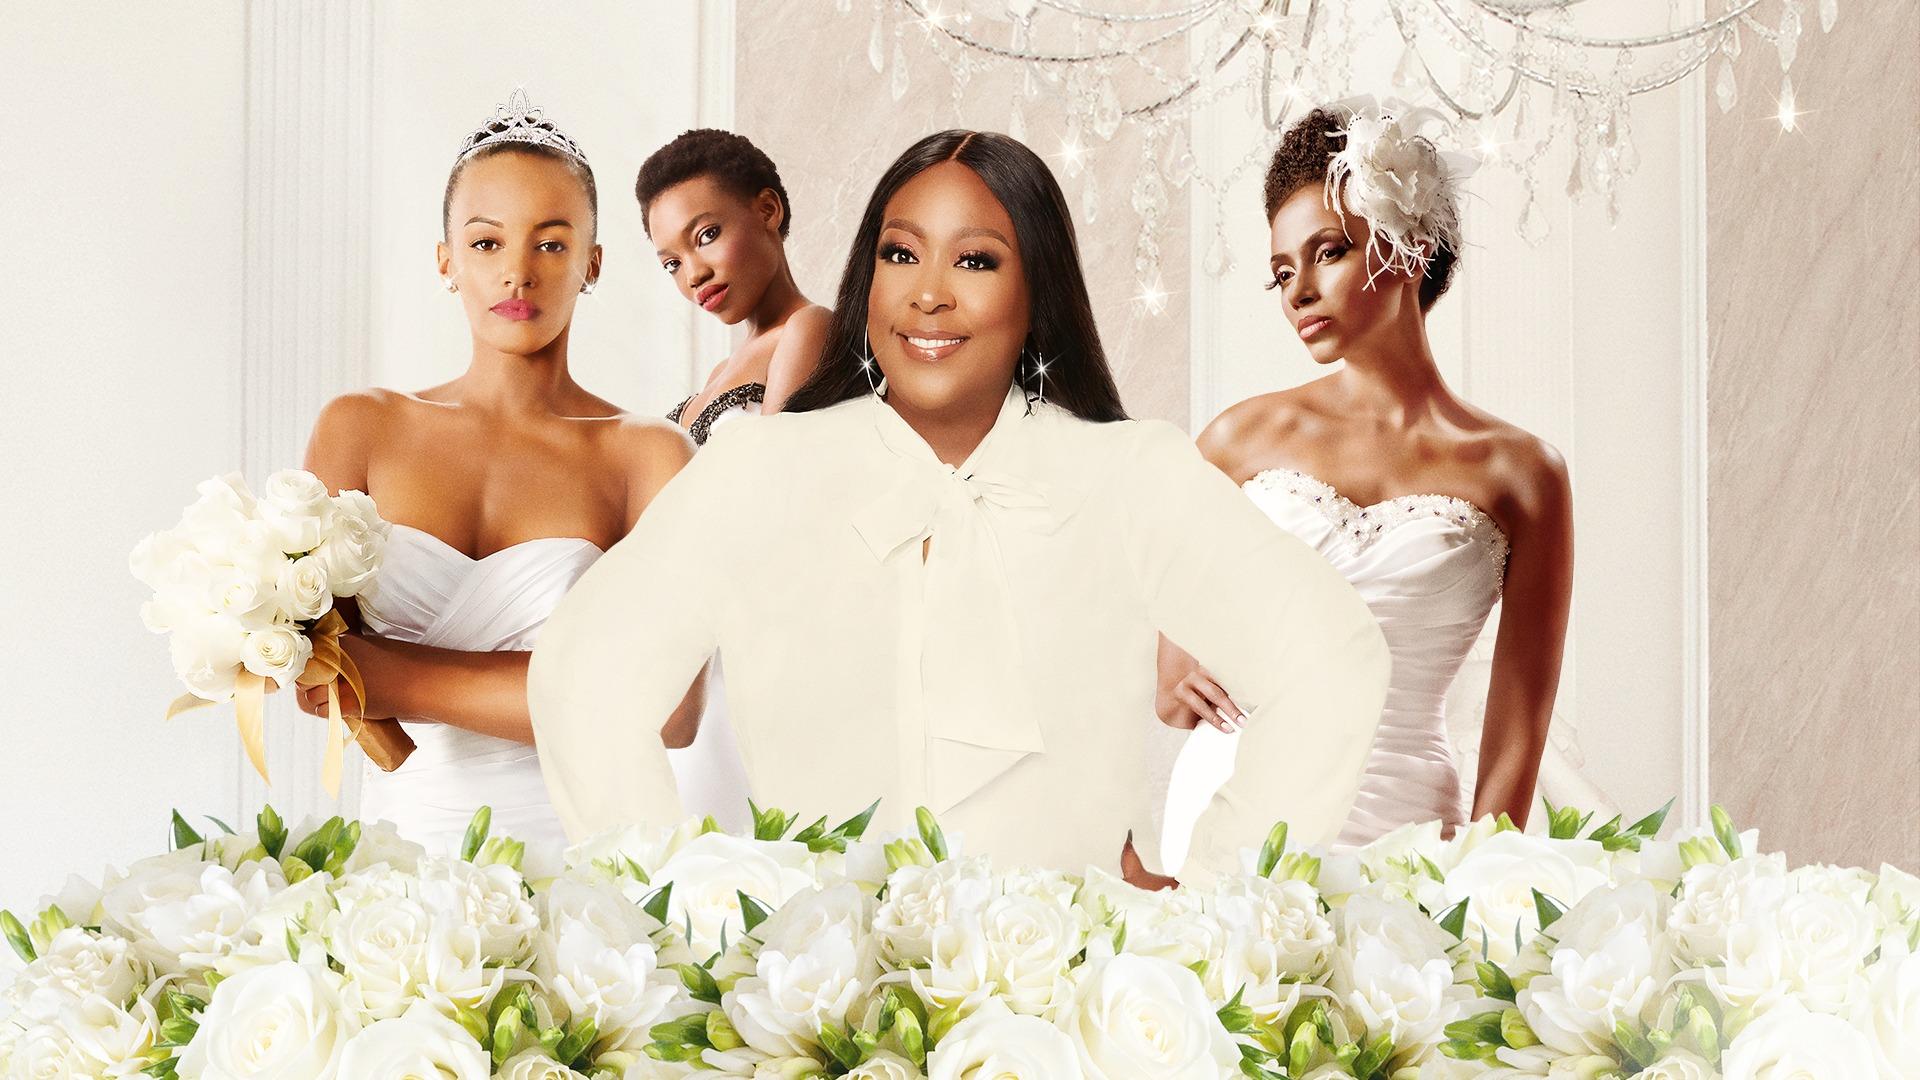 Watch Bridezillas Online Stream New Full Episodes We Tv,Mother Of The Groom Dress For Beach Wedding